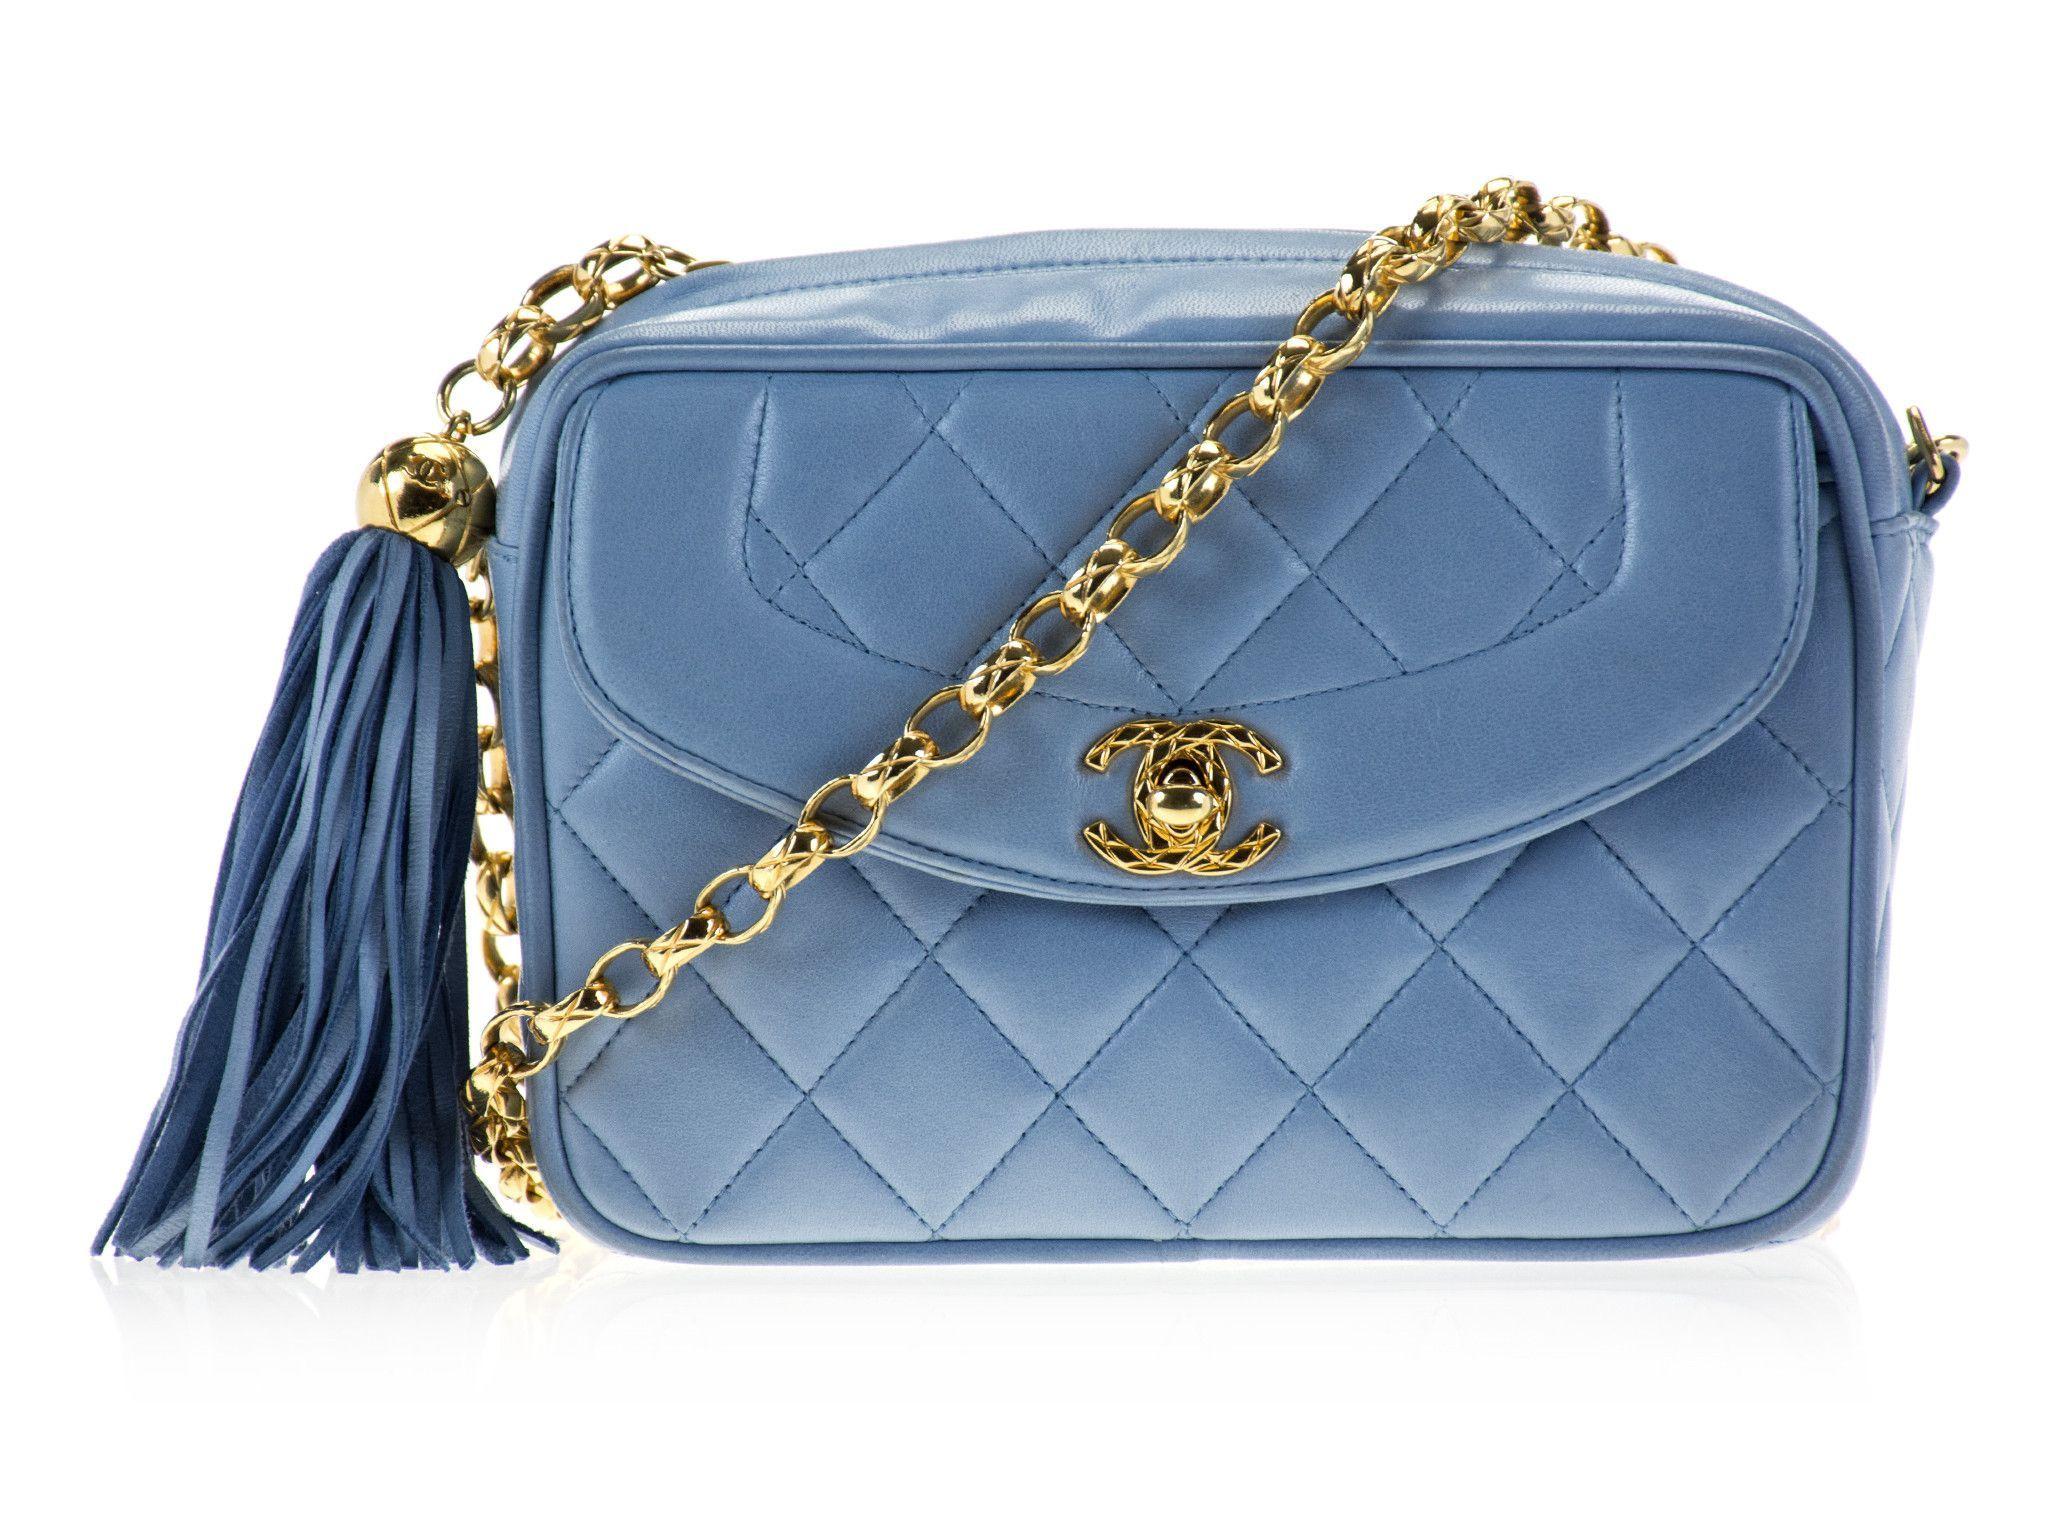 Chanel Vintage Blue Camera Bag Bags Chanel Bag Designer Purses And Handbags